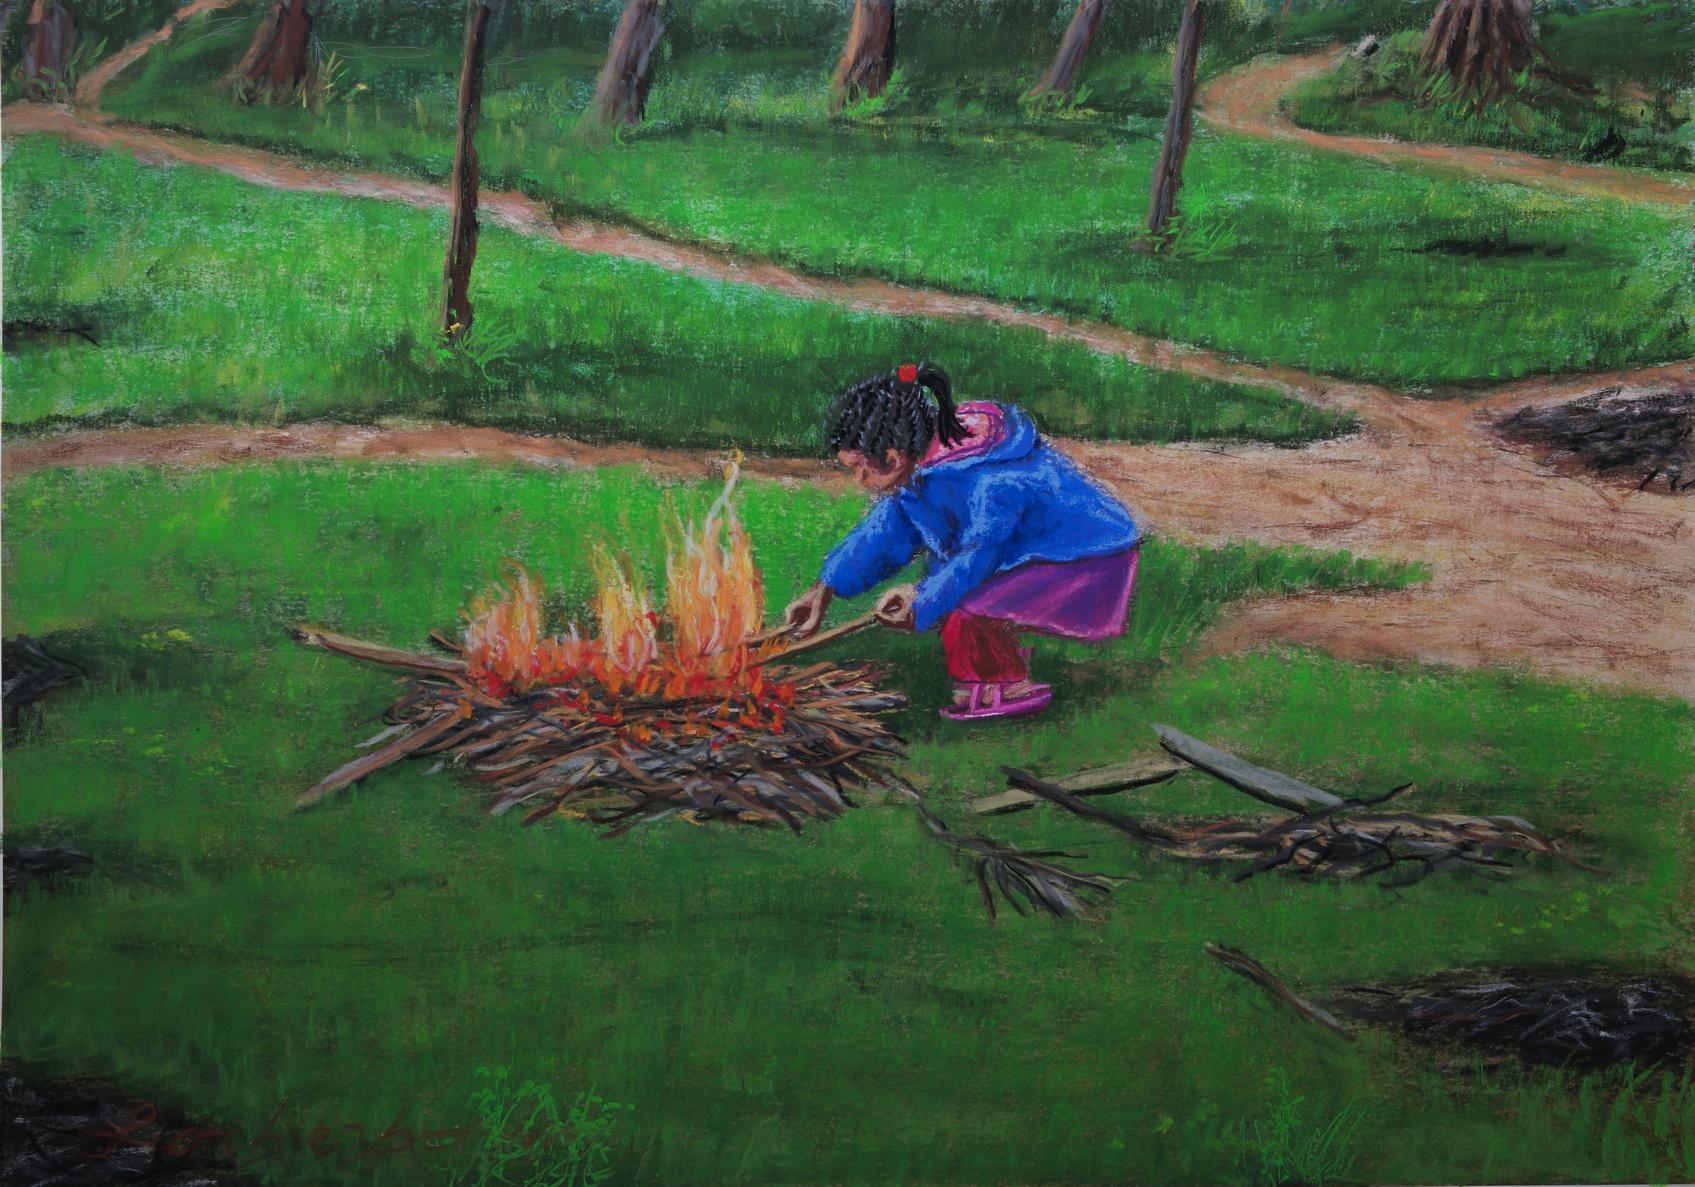 Little girl playing fire, Soft pastels, Koh Lanta, Laos. Lorberboim Soft Pastel Painting.